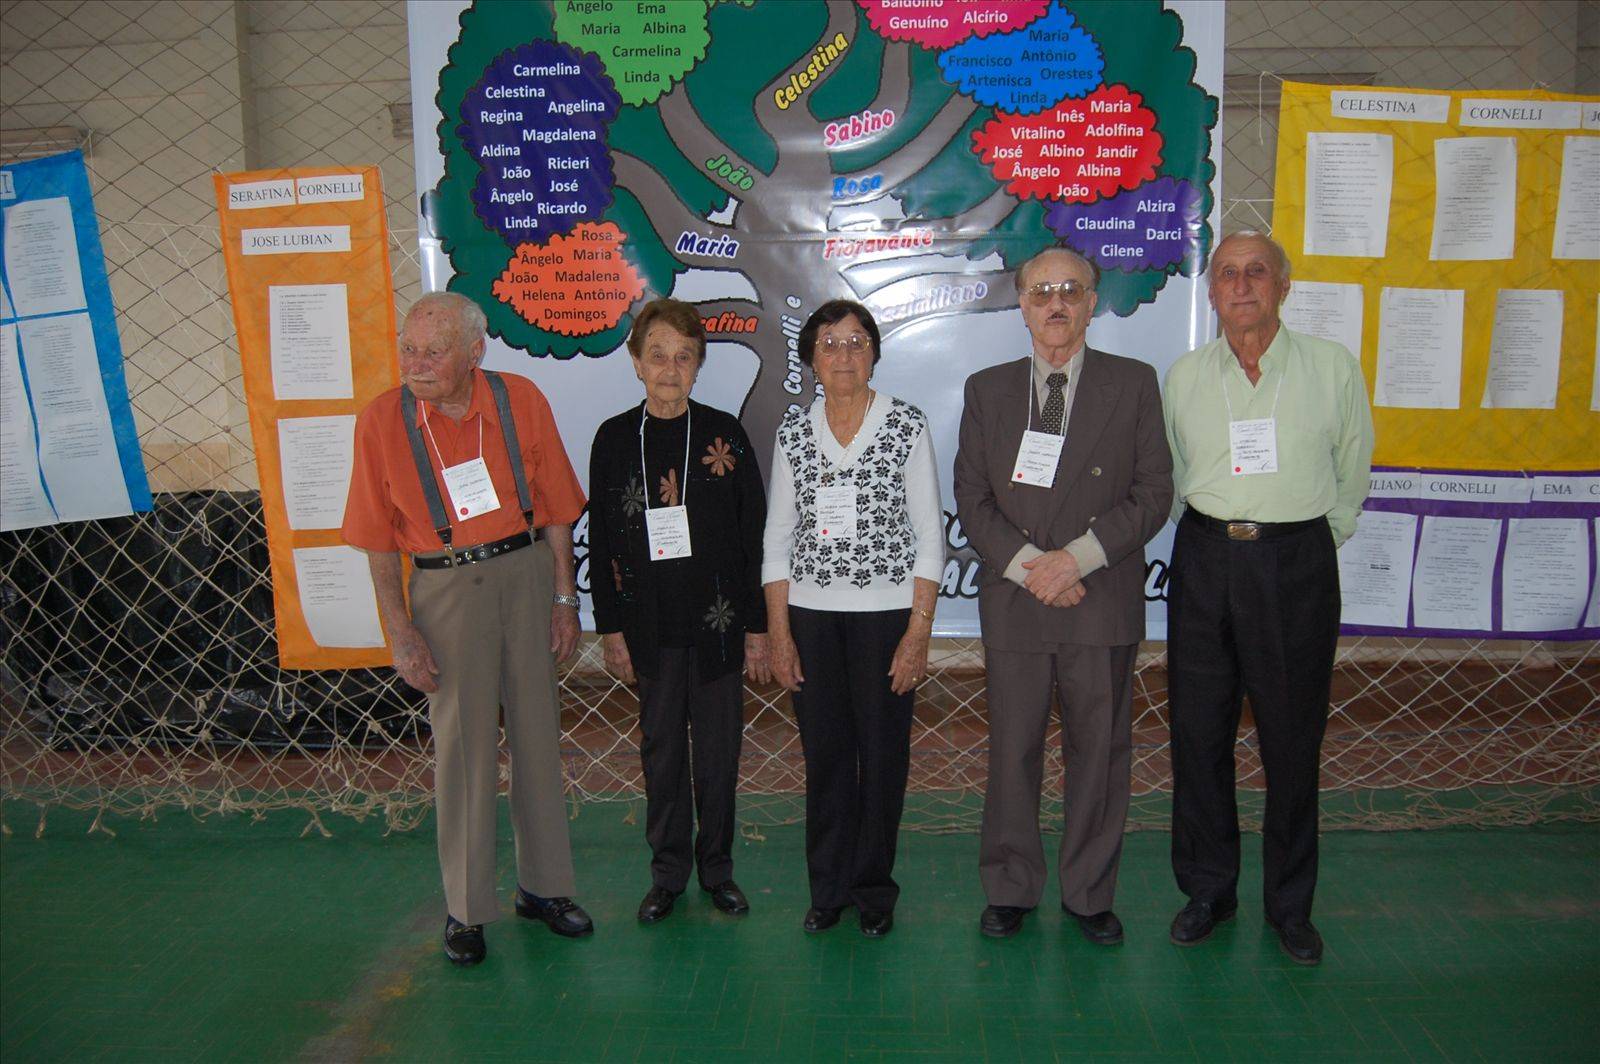 2º Encontro Família Cornelli - 11.10.2009 (197)_0